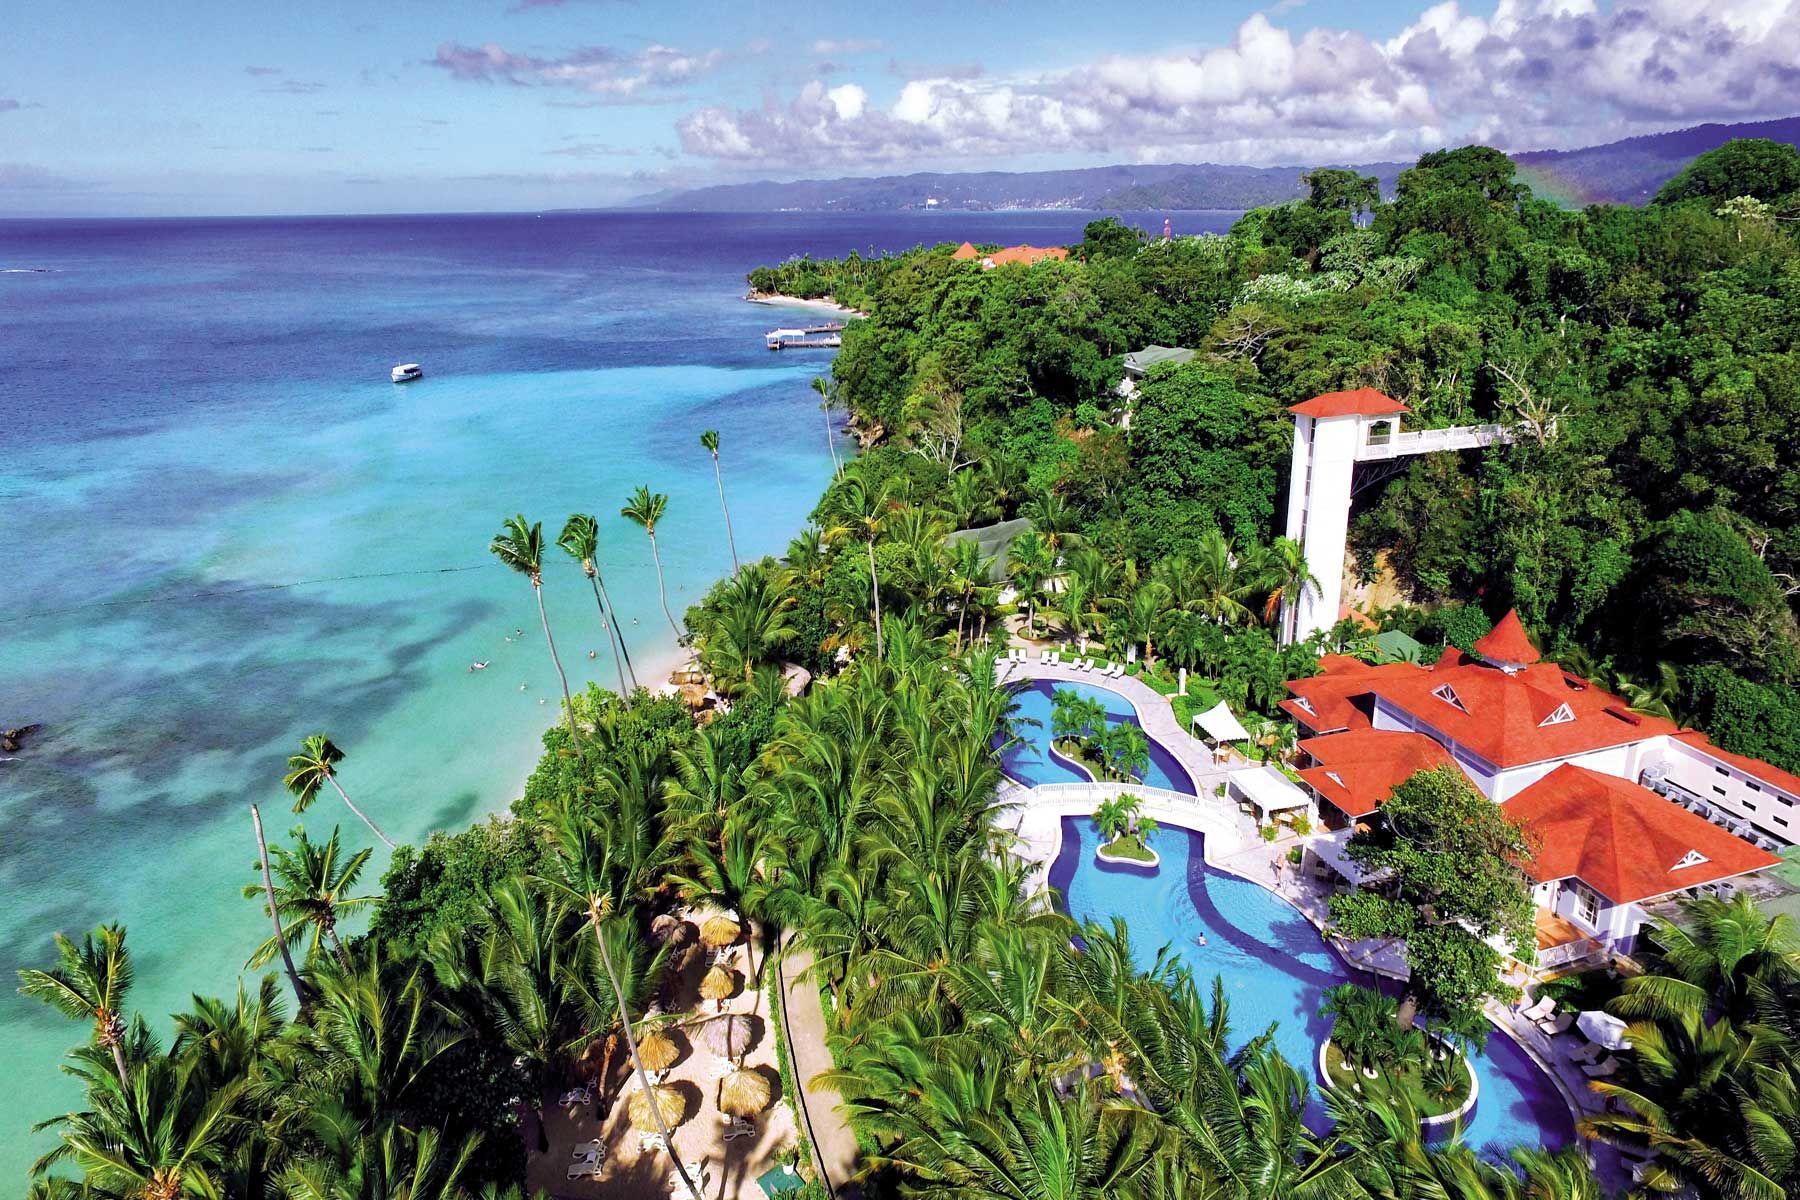 Luxury Bahia Principe Dominican Republic Best All Inclusive Resorts Resort Hotels And Resorts